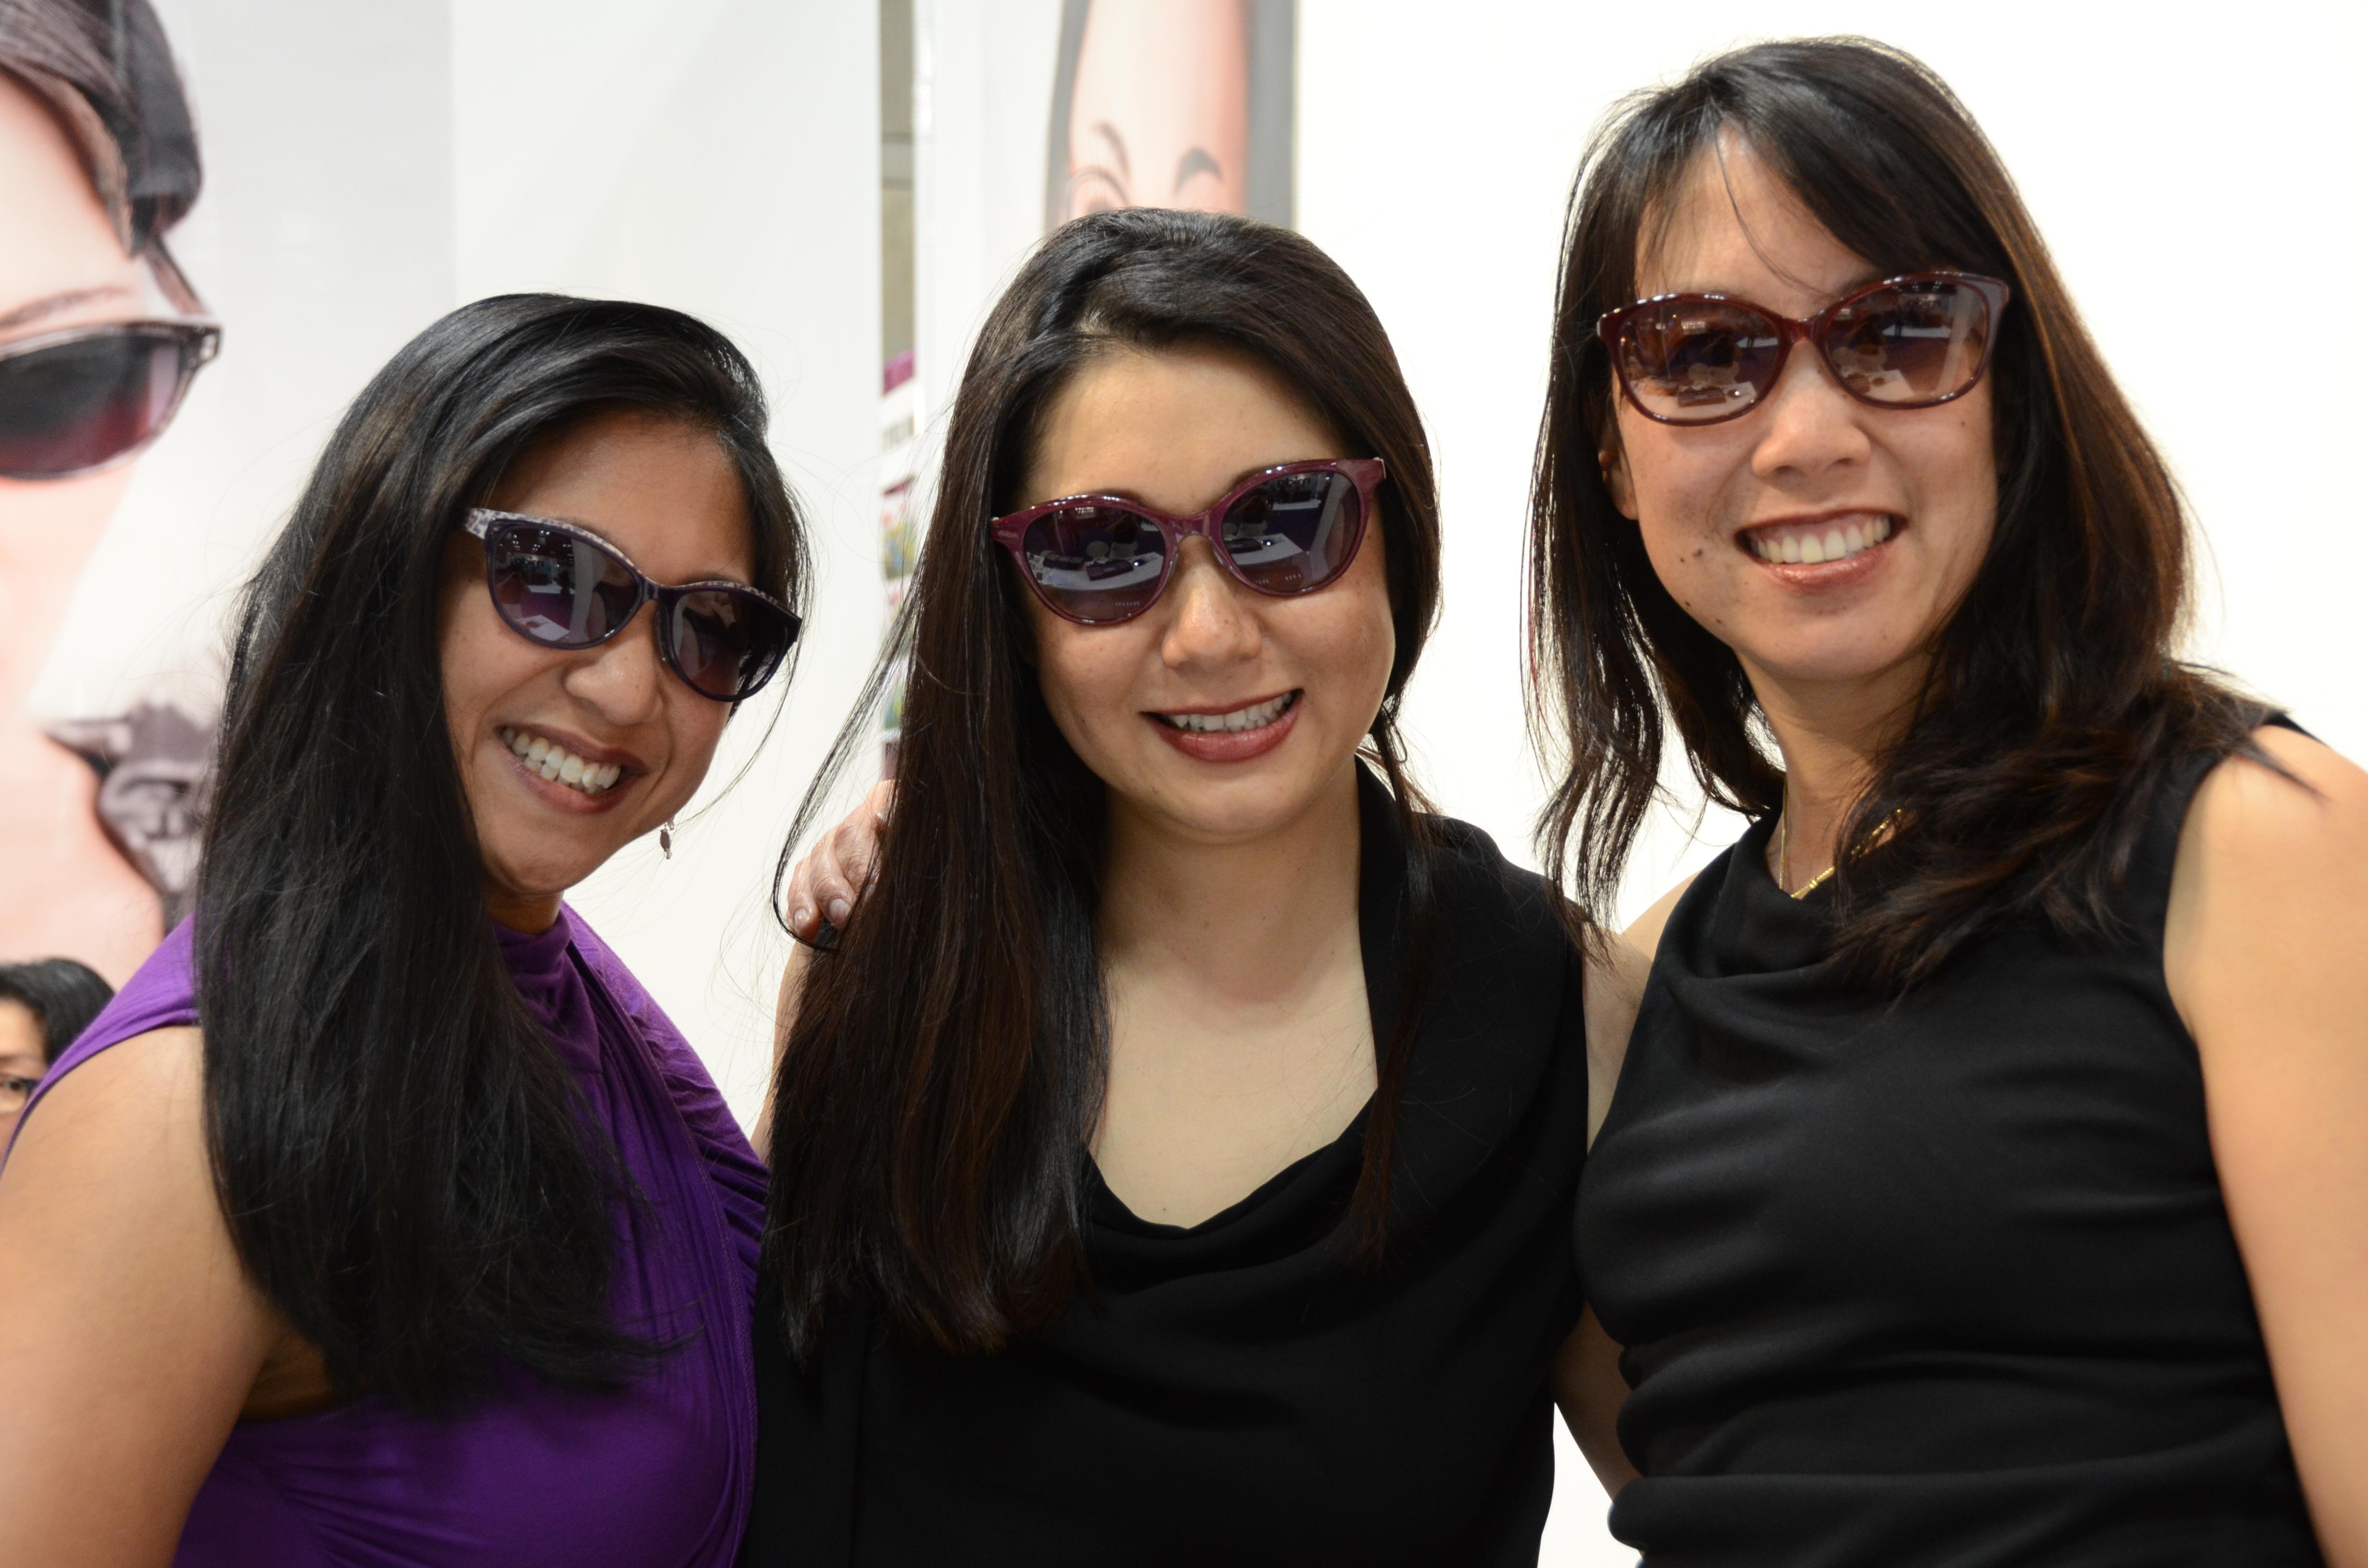 201532bcb73 The ladies of 20 20 Optometry and TC Charton